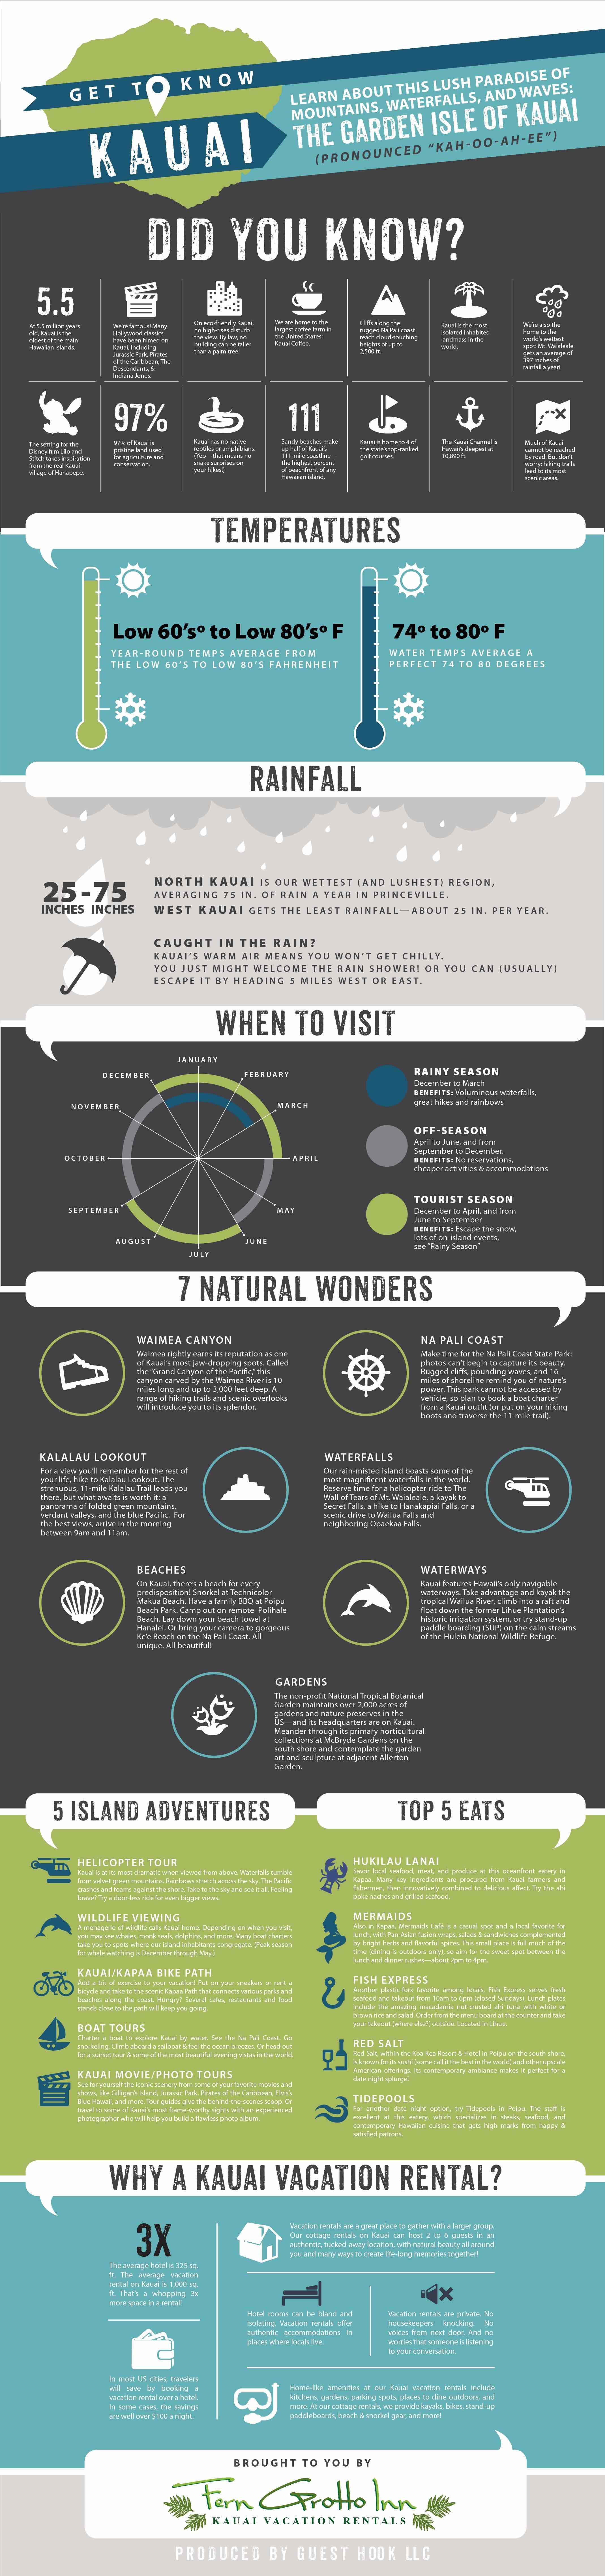 kauai-cottages-infographic